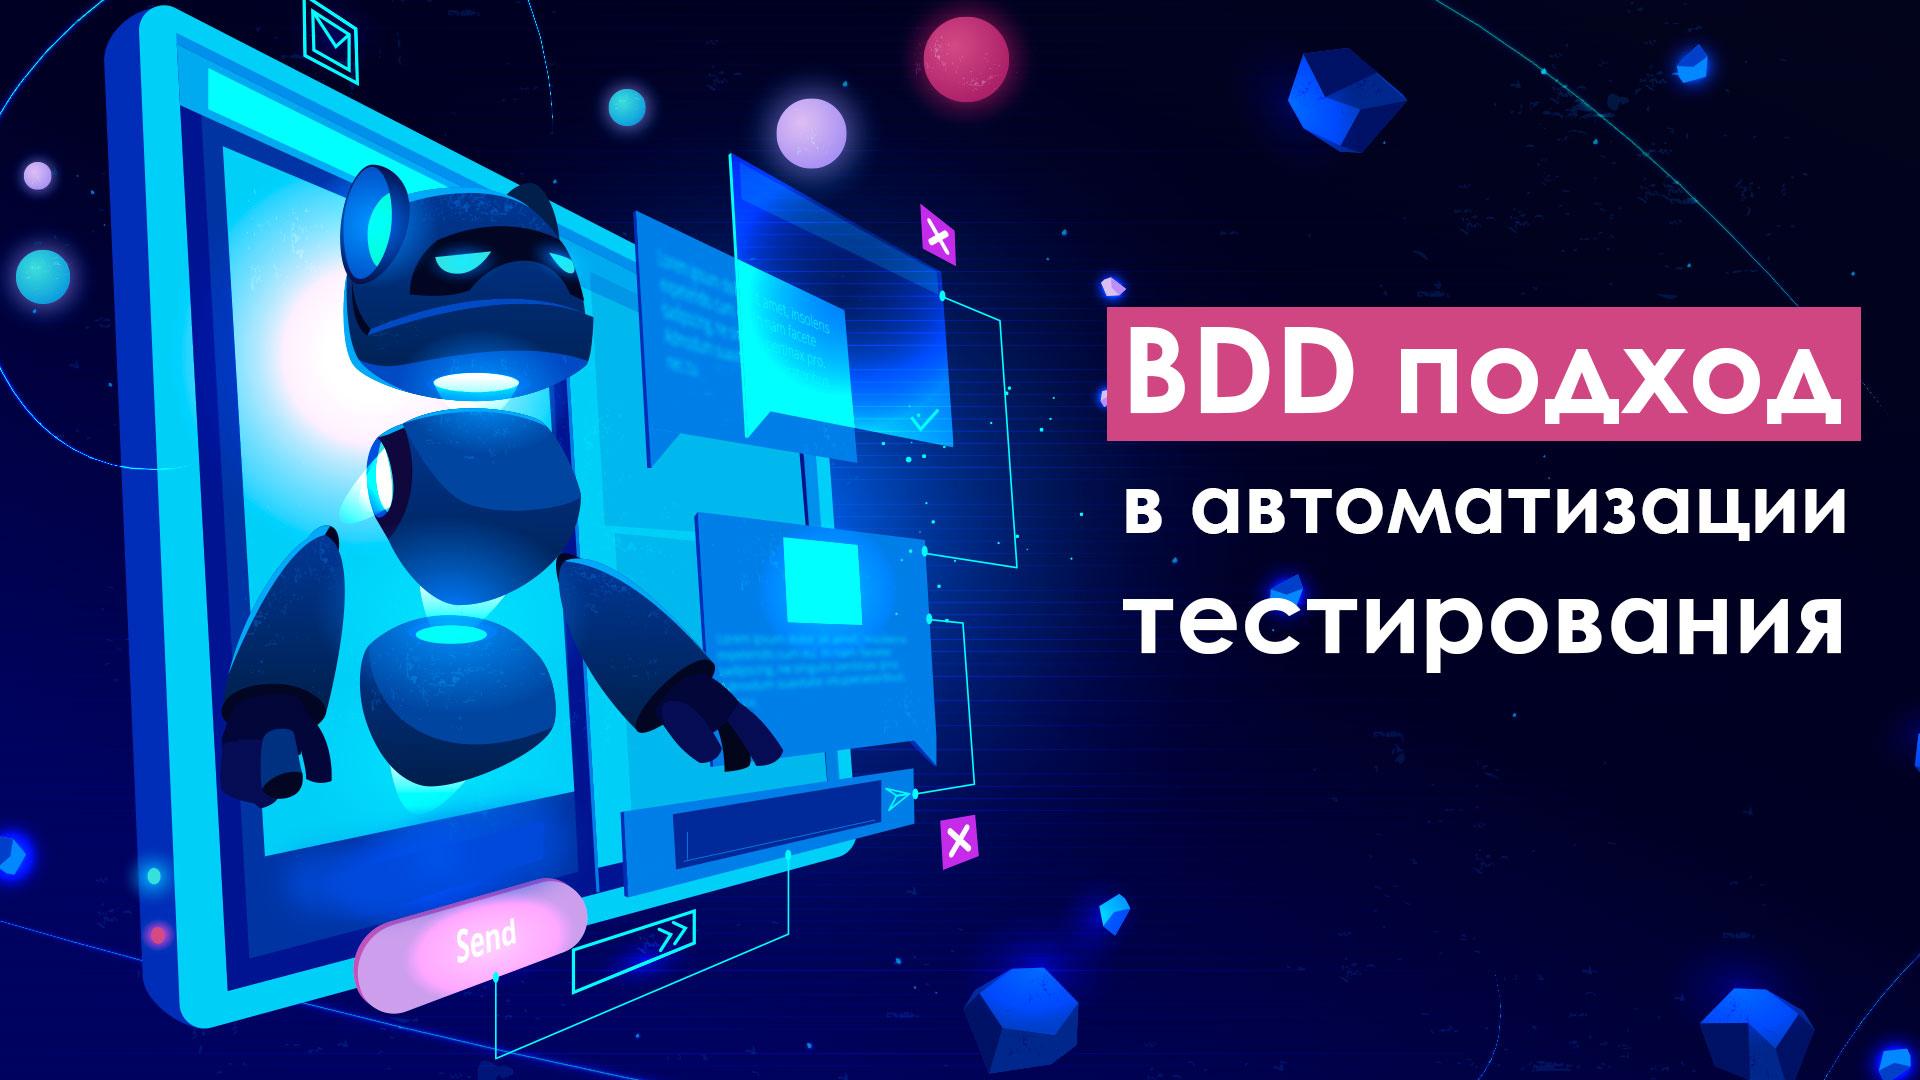 BDD подход в автоматизации тестирования